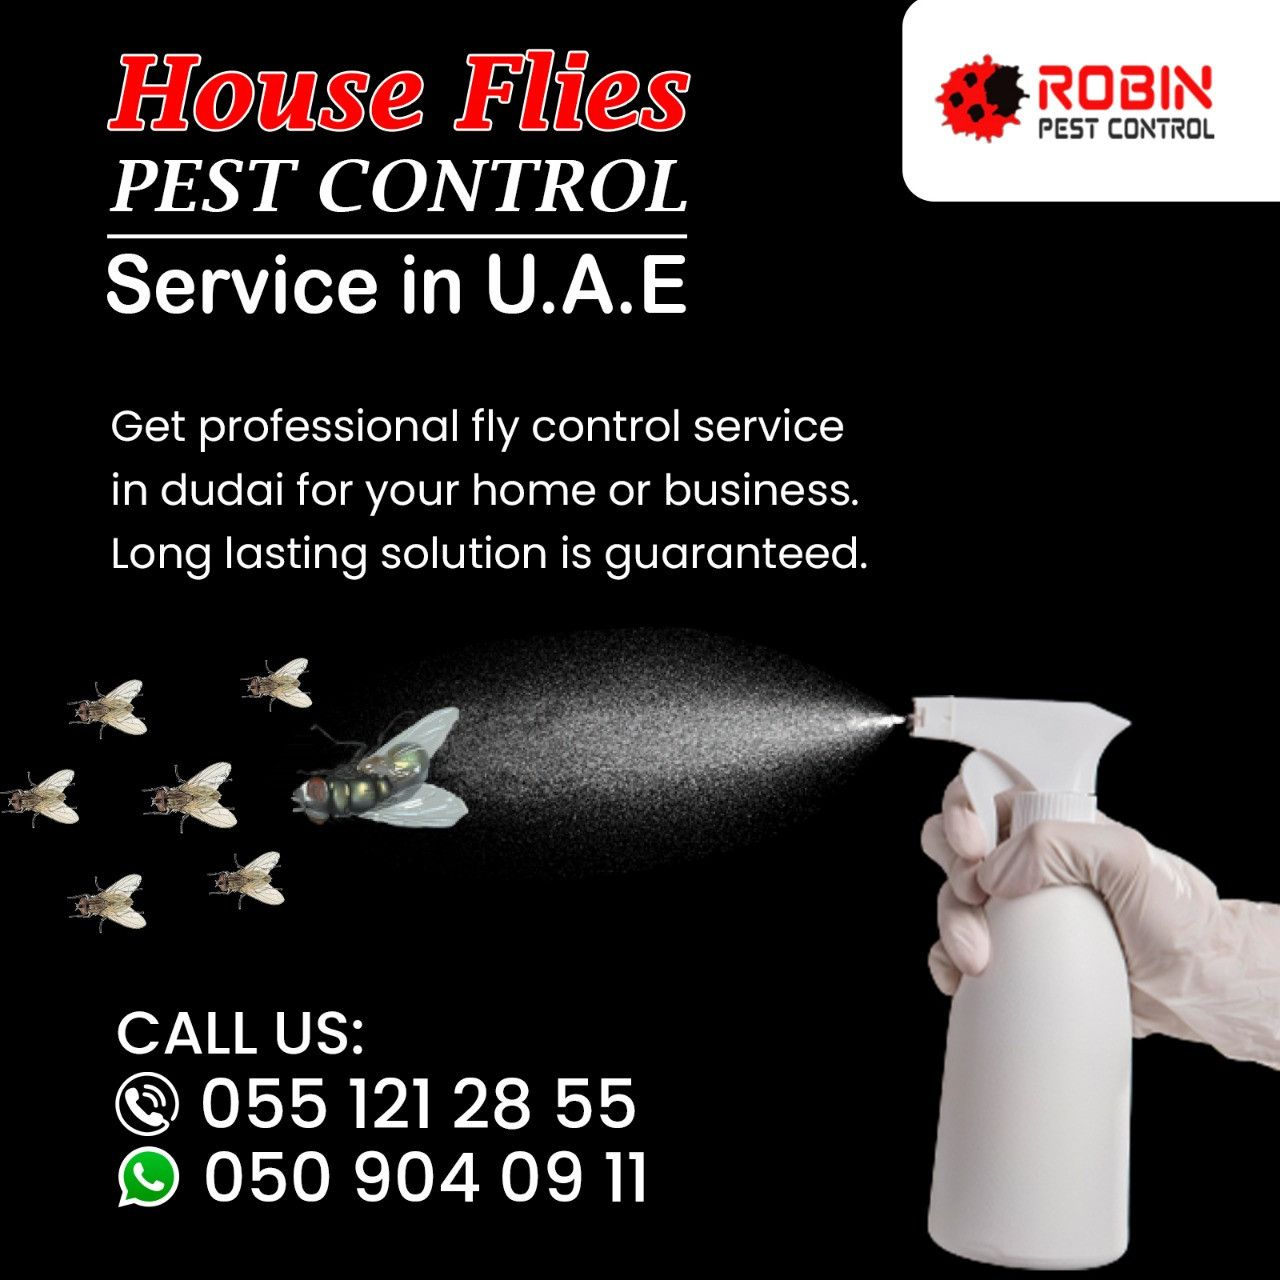 Robin Pest Control 5